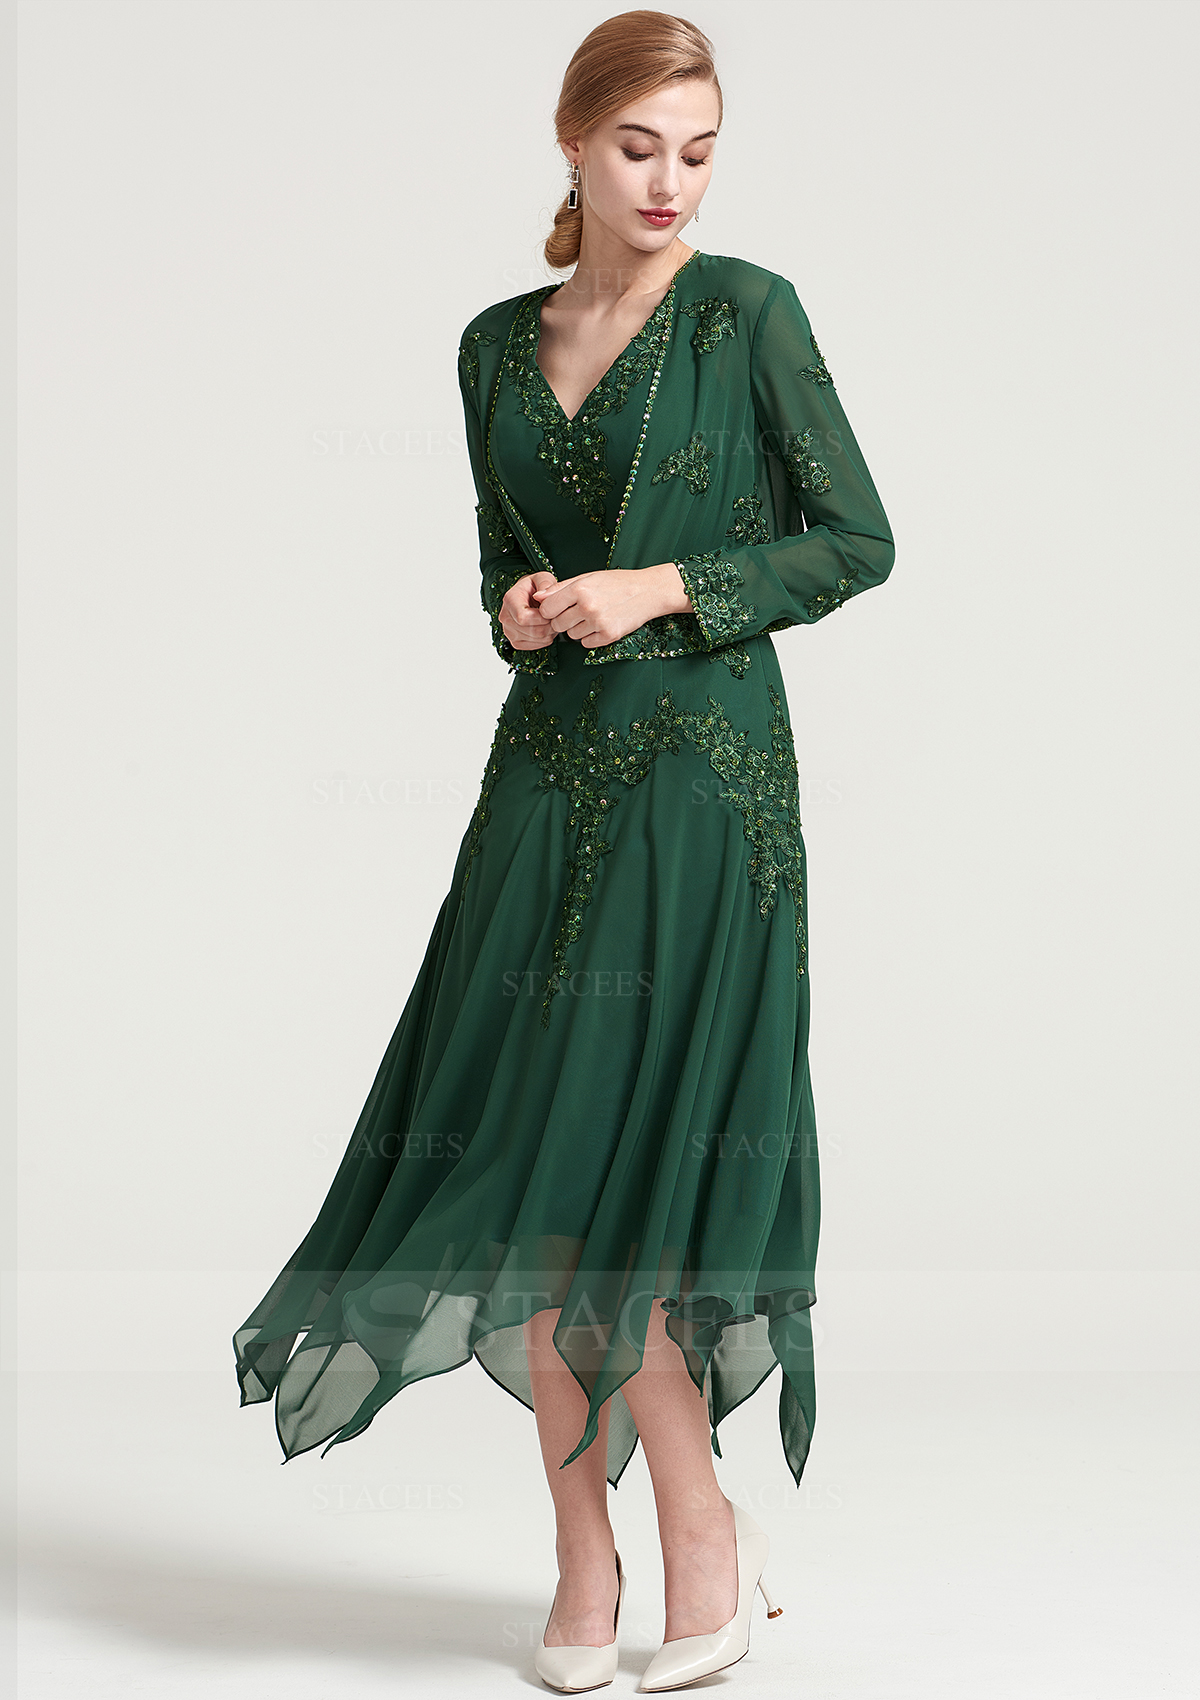 78f1faa89301fc A-line/Princess V Neck Short Sleeve Tea-Length Chiffon Mother of the ...